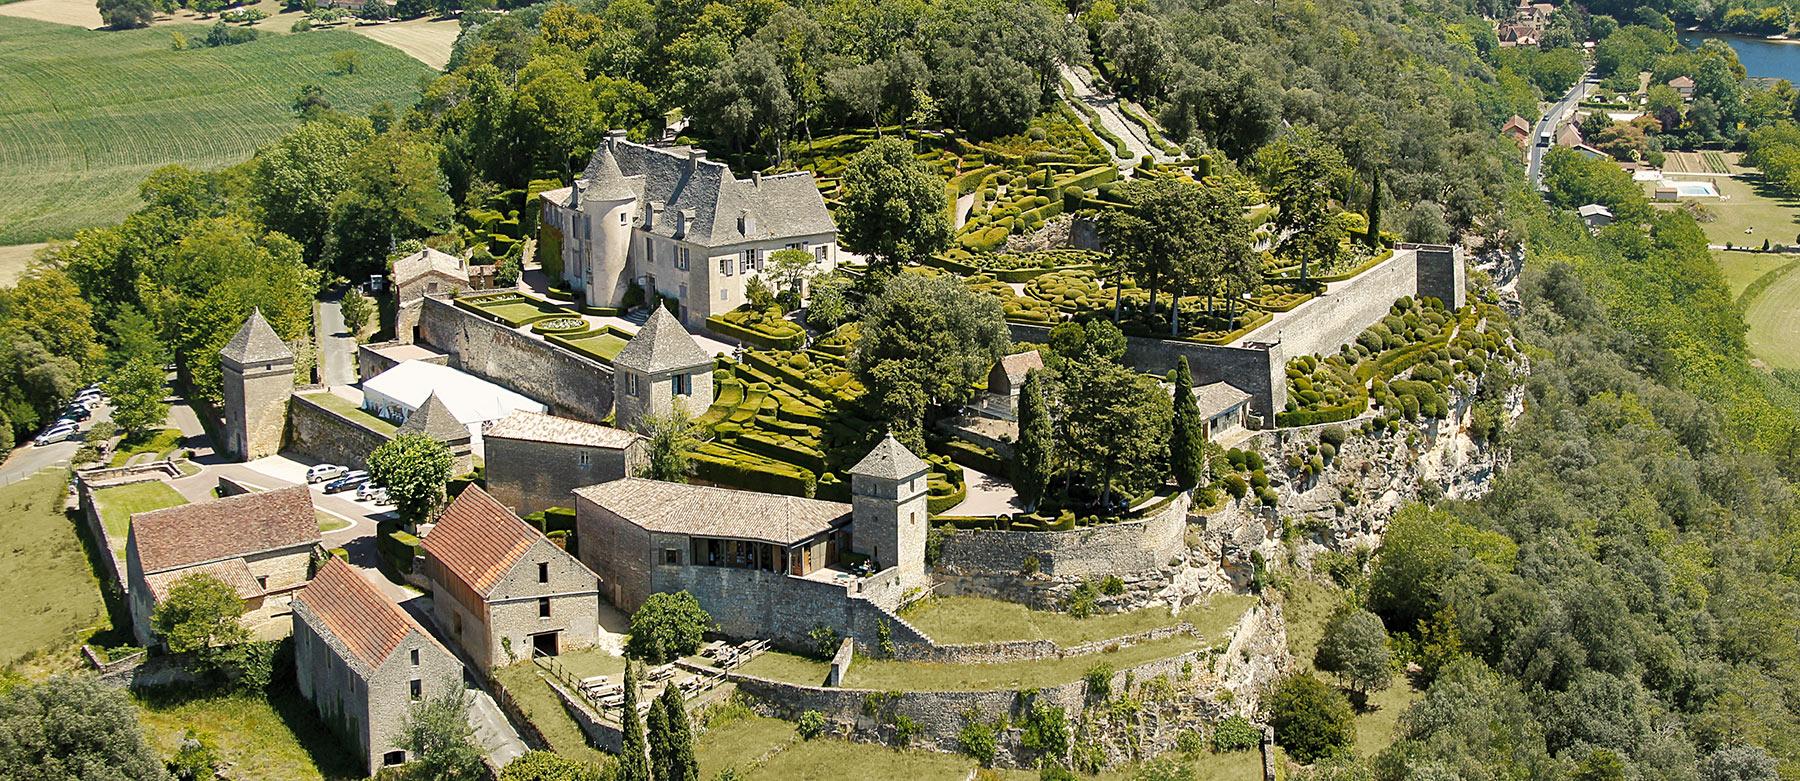 The overhanging gardens of Marqueyssac in Dordogne Sarlat Périgord